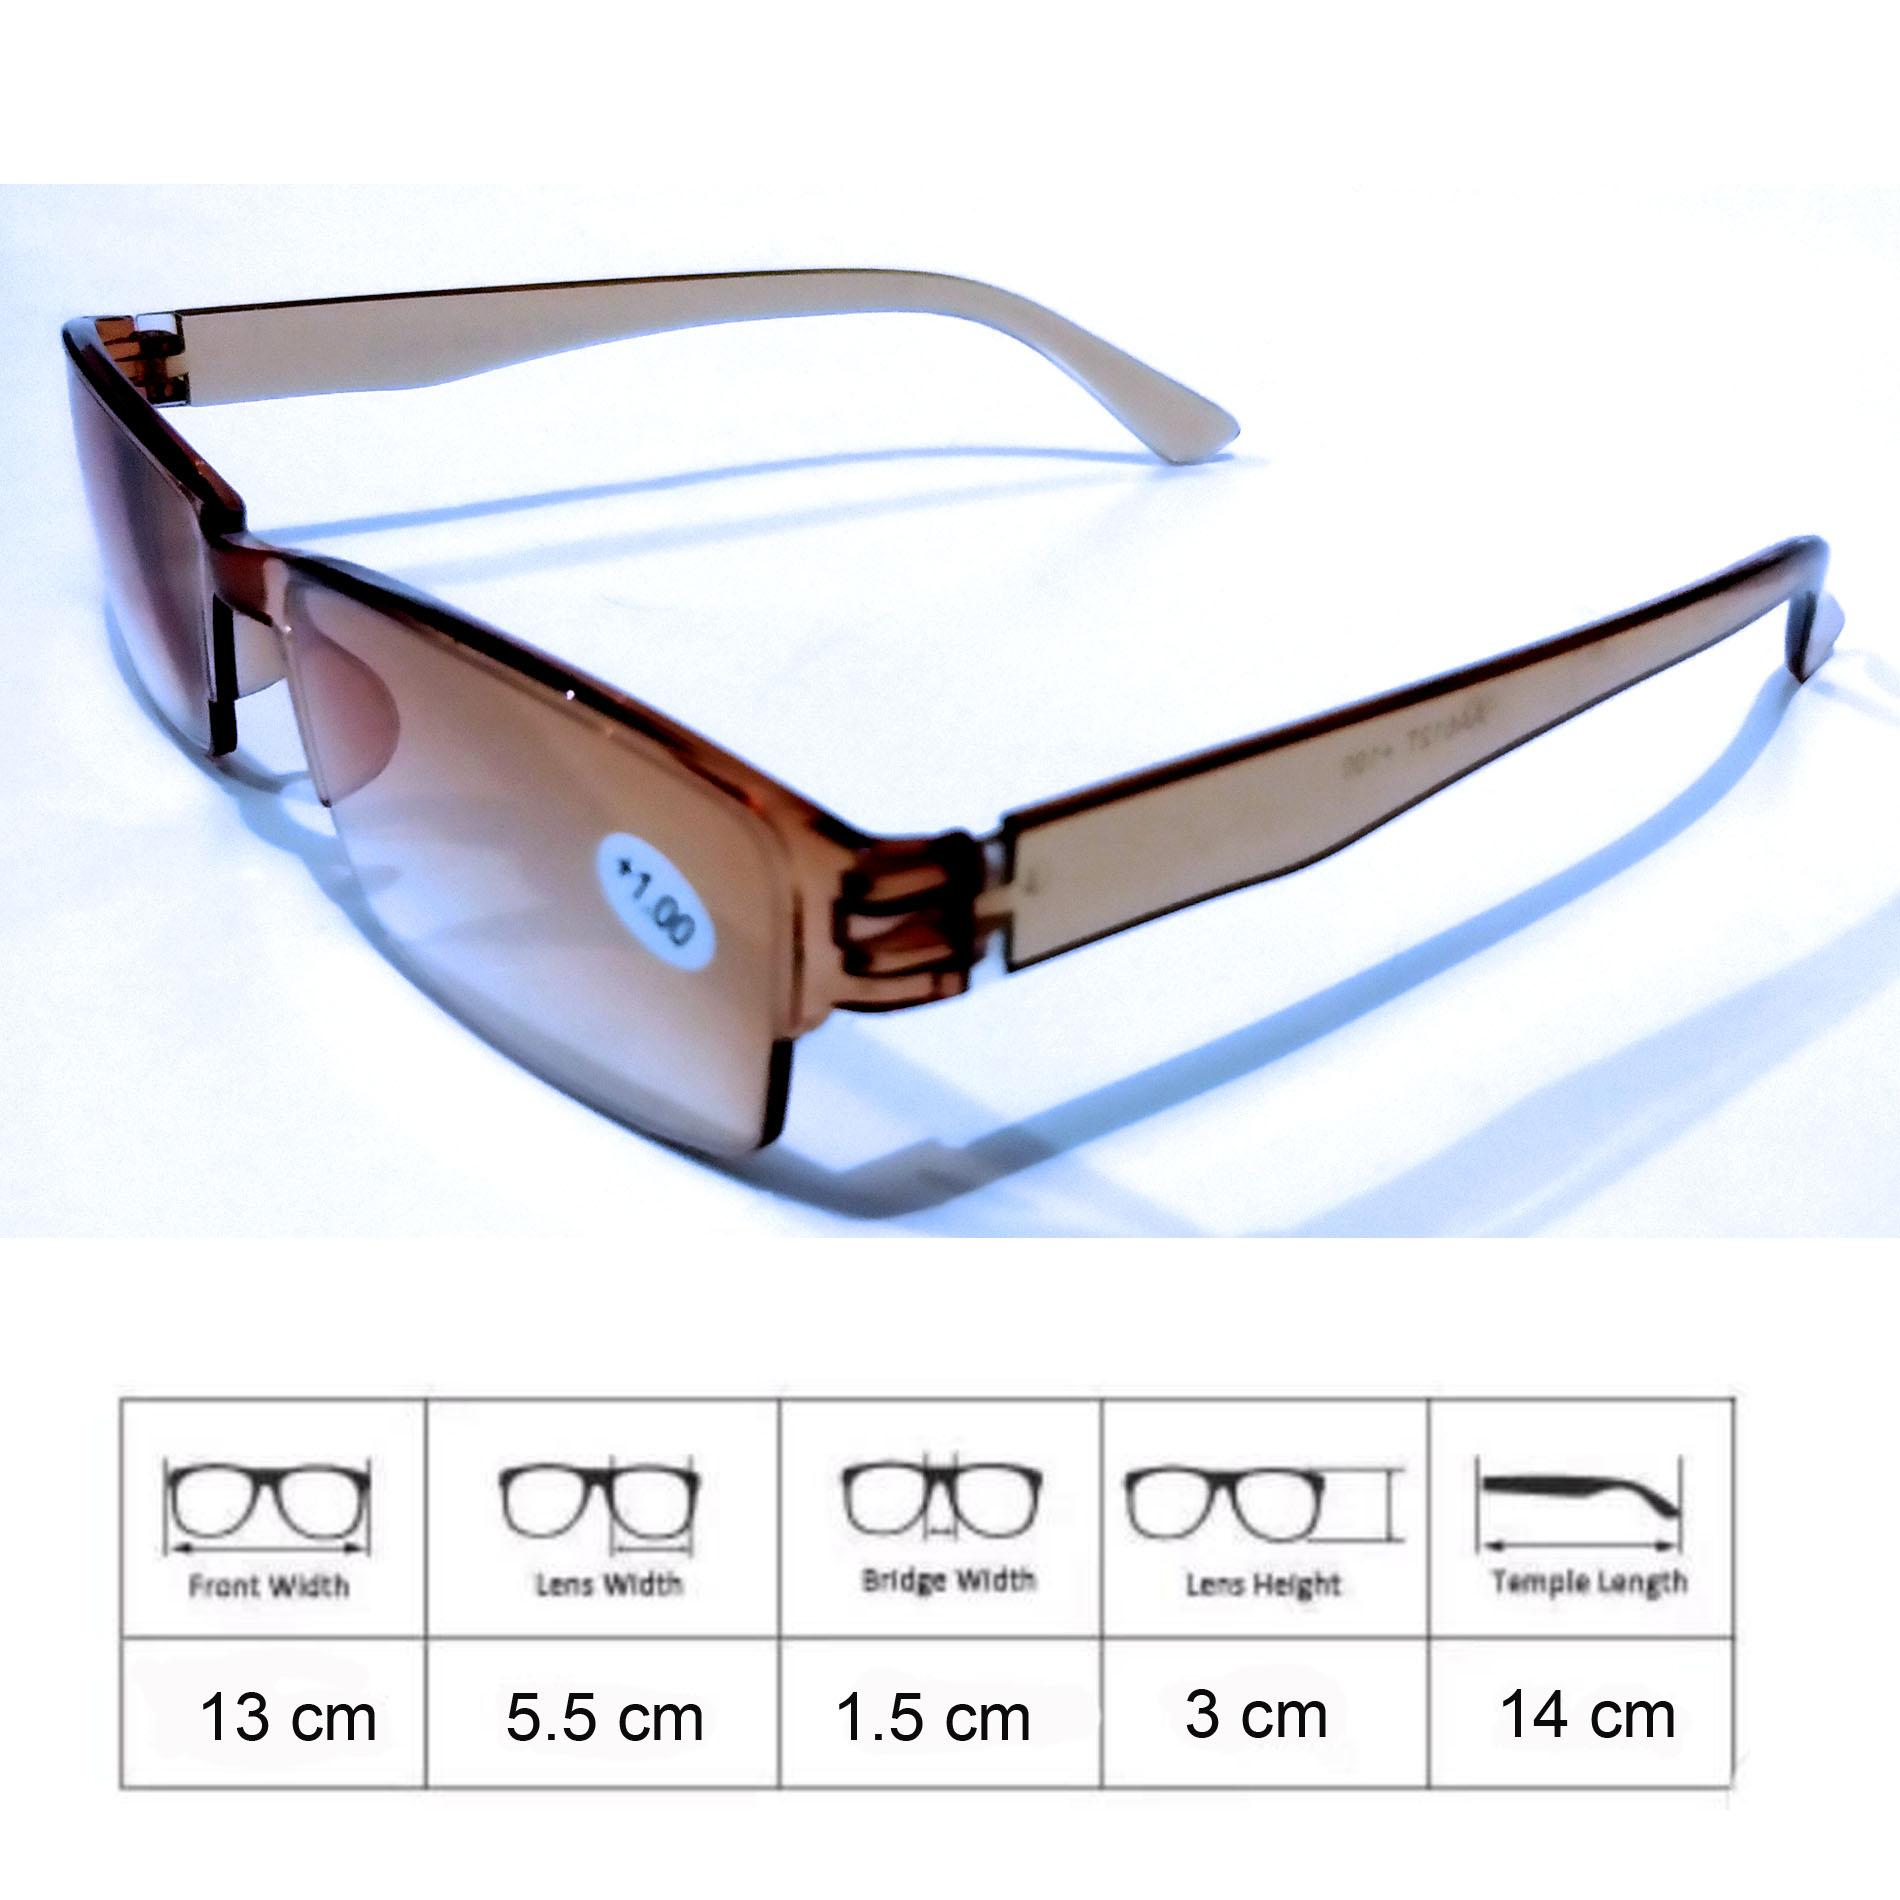 Rp 20.000. RAKA eyewear - Kacamata Baca ...